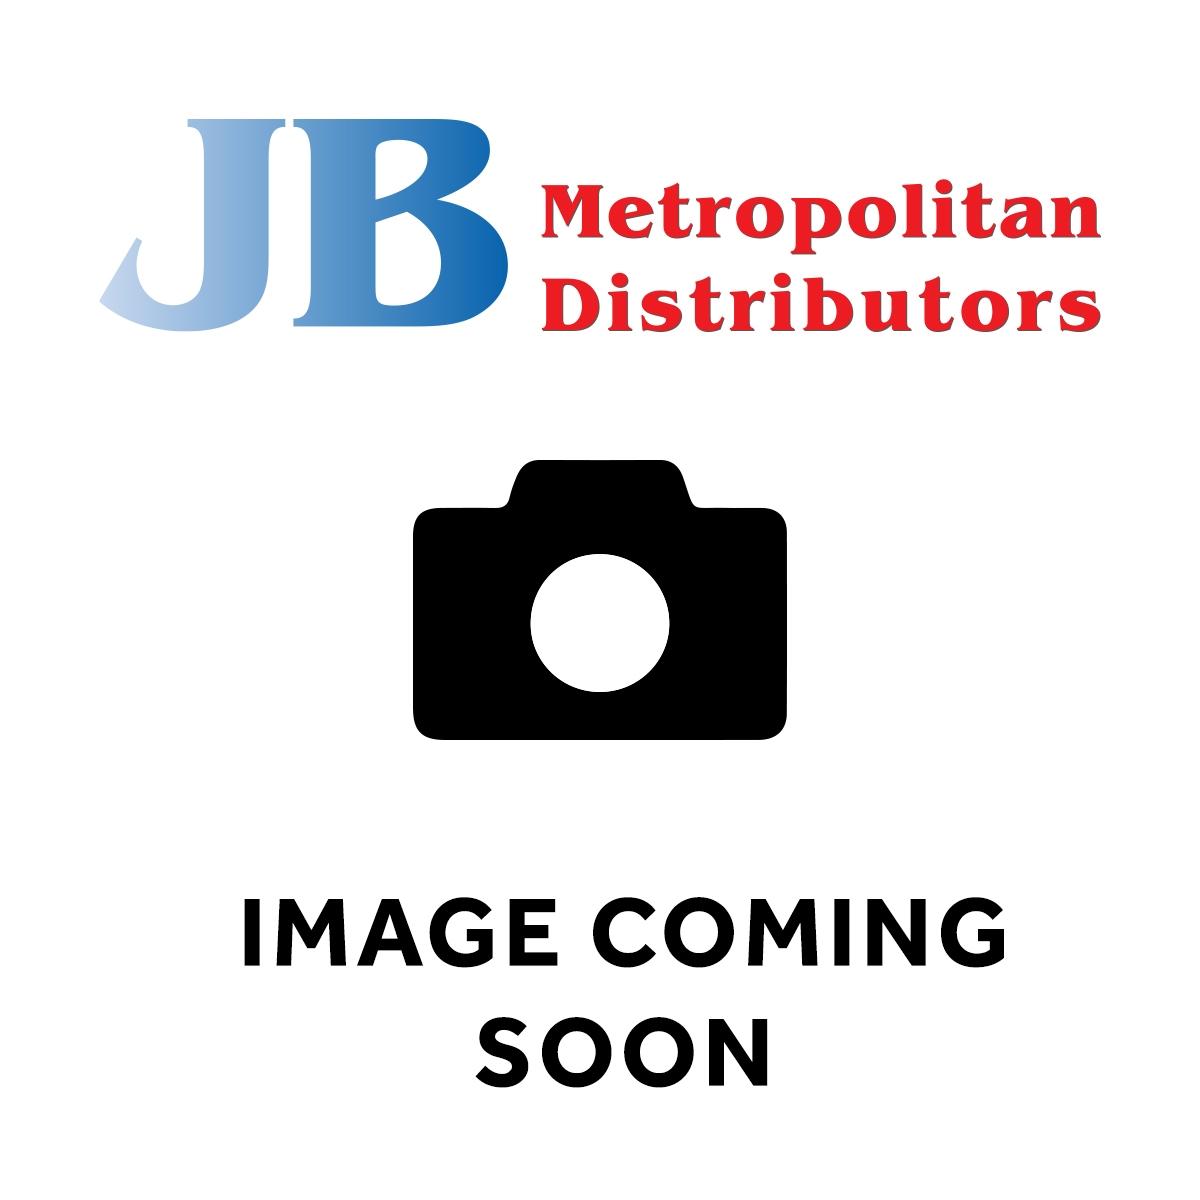 REESES NUTRAGEOUS BAR 47G(18)